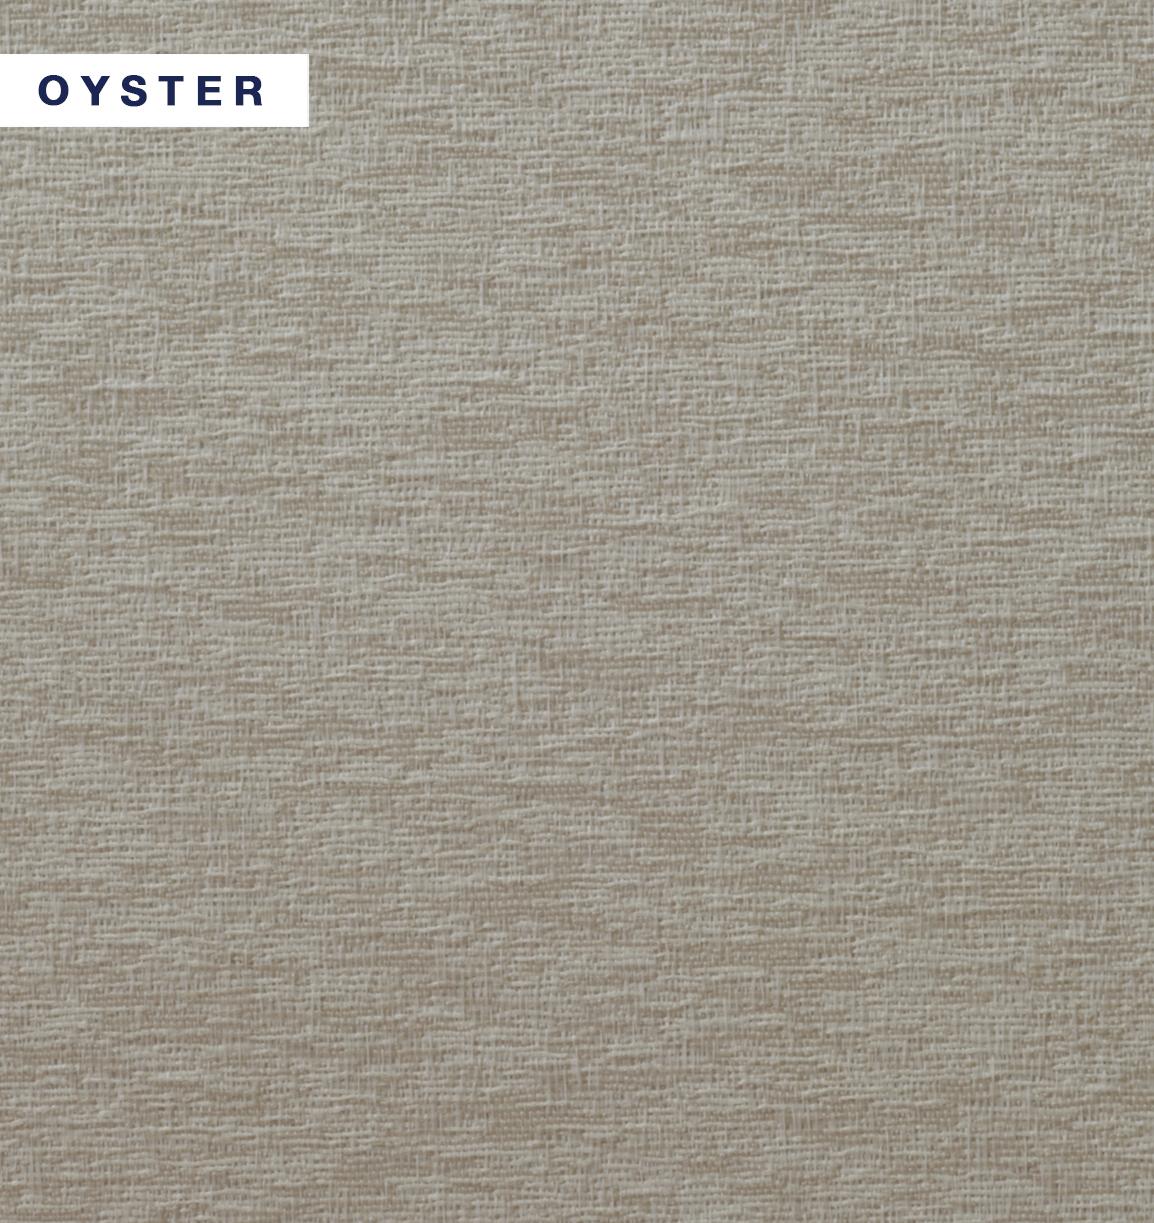 Skye - Oyster.jpg